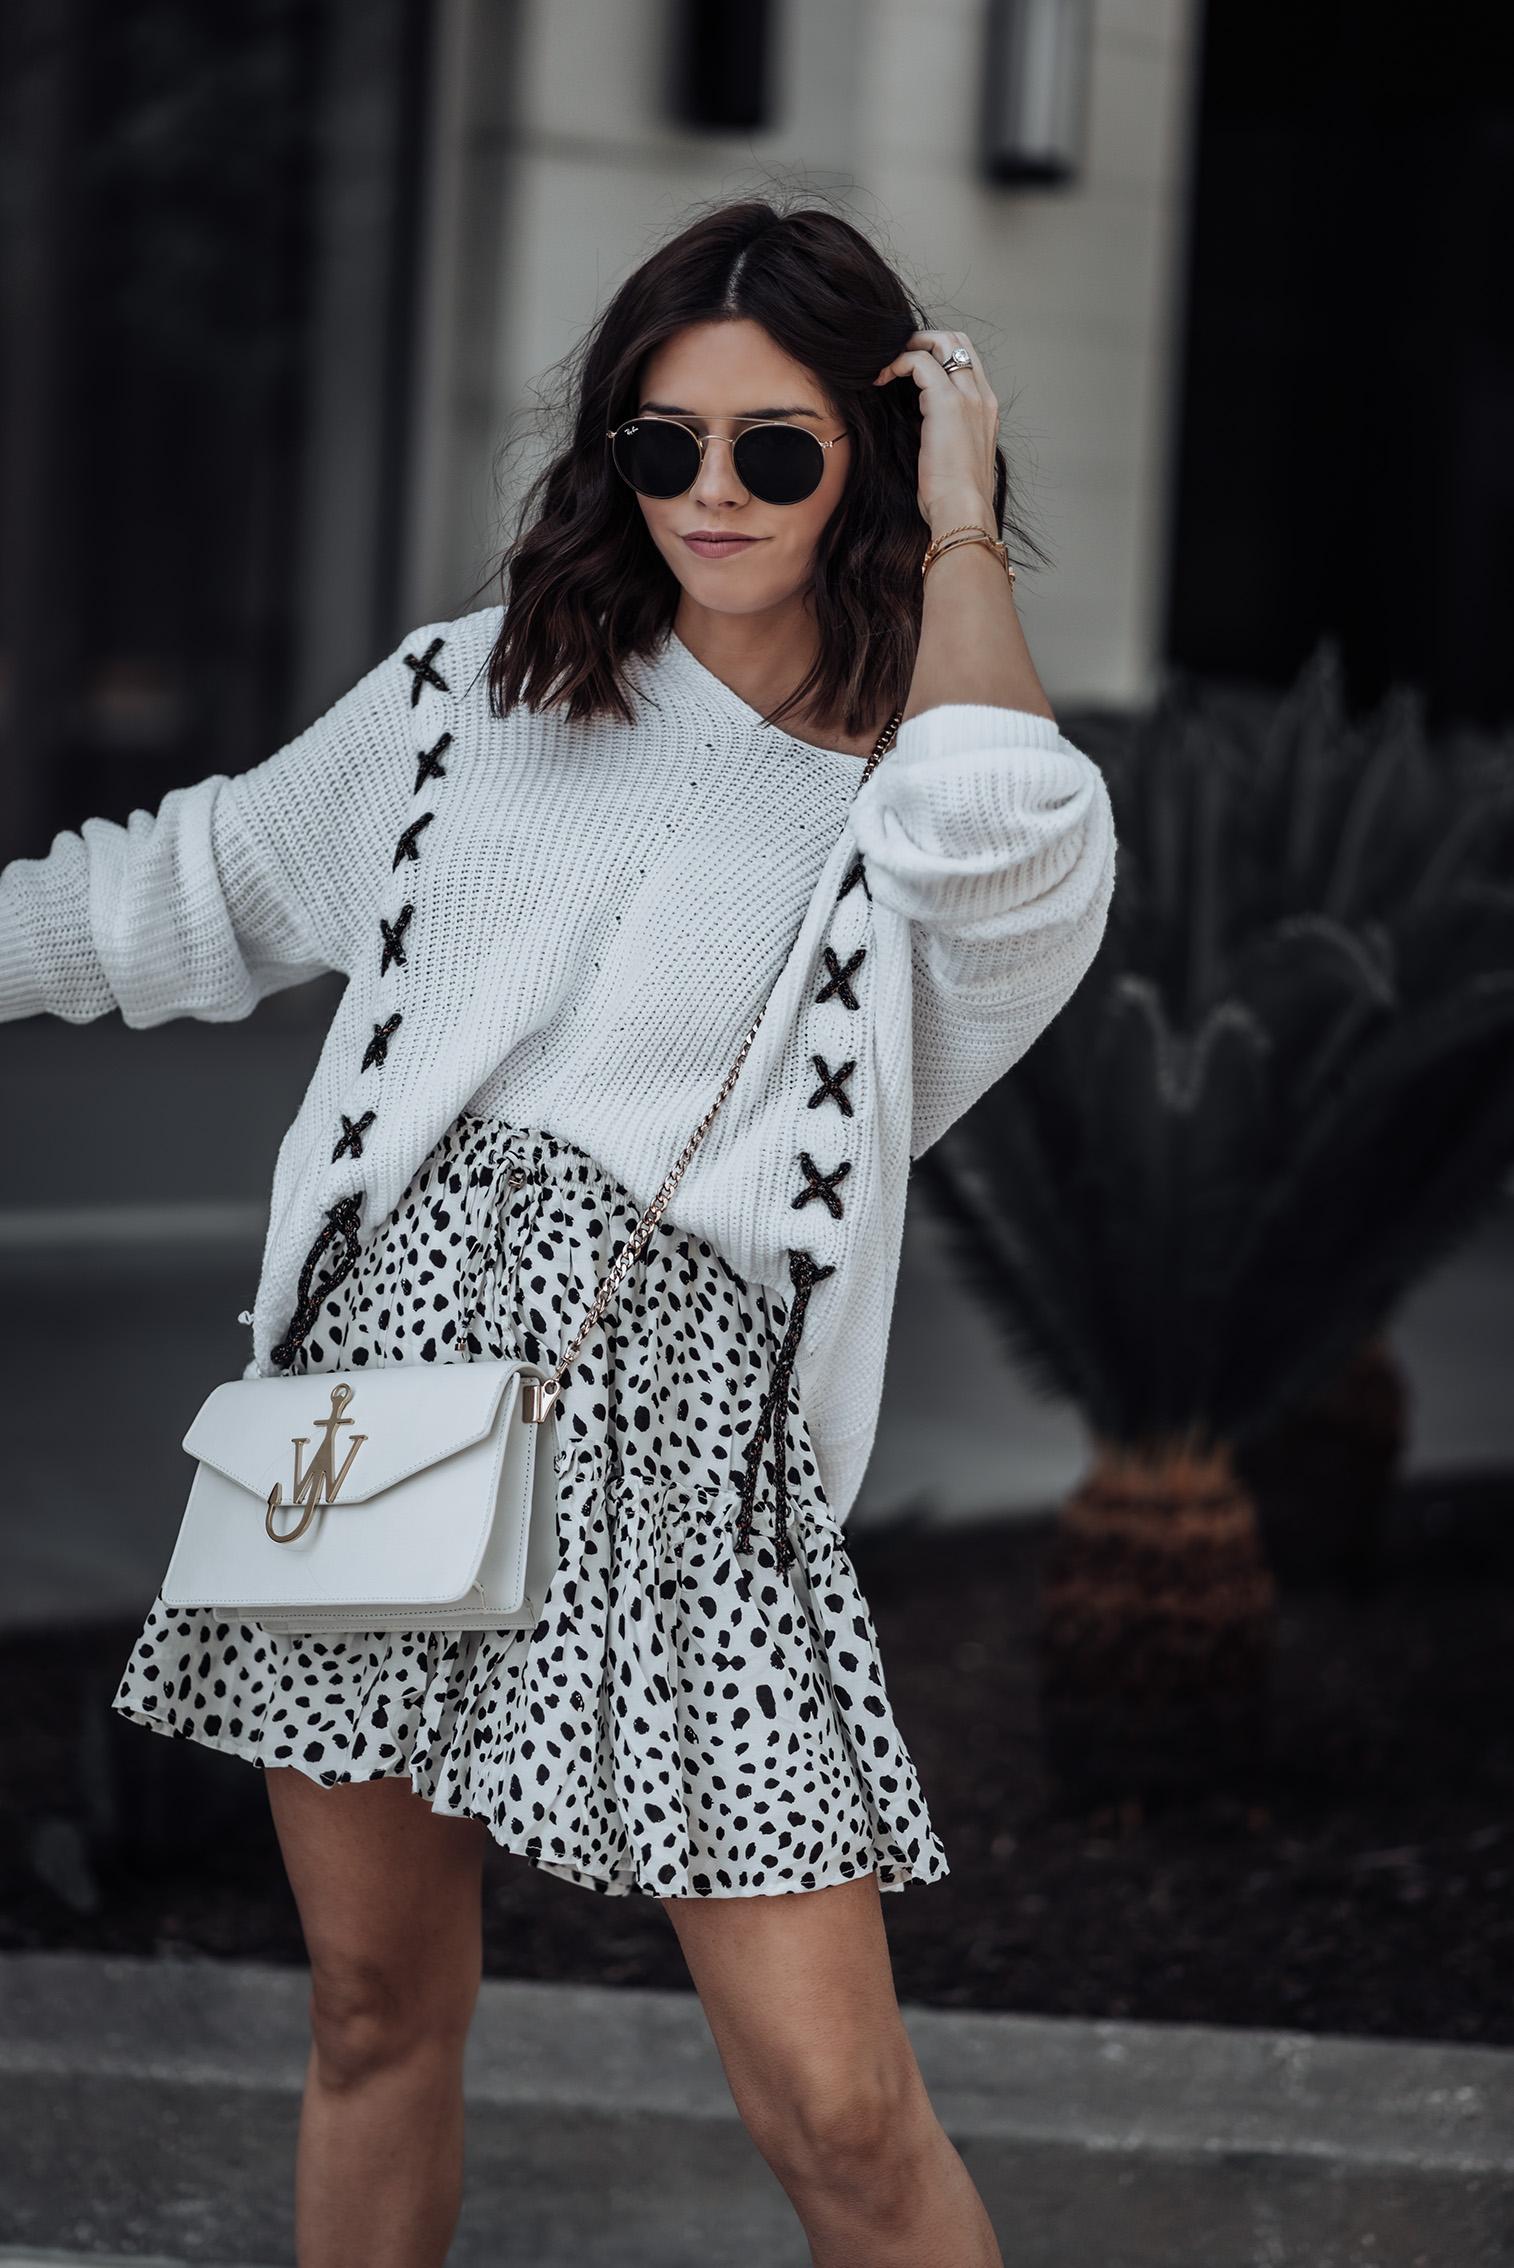 Printed Skirt (similar) | Sweater (similar) | Superga Platform Sneakers | JW Anderson Bag #liketkit #casualstyle